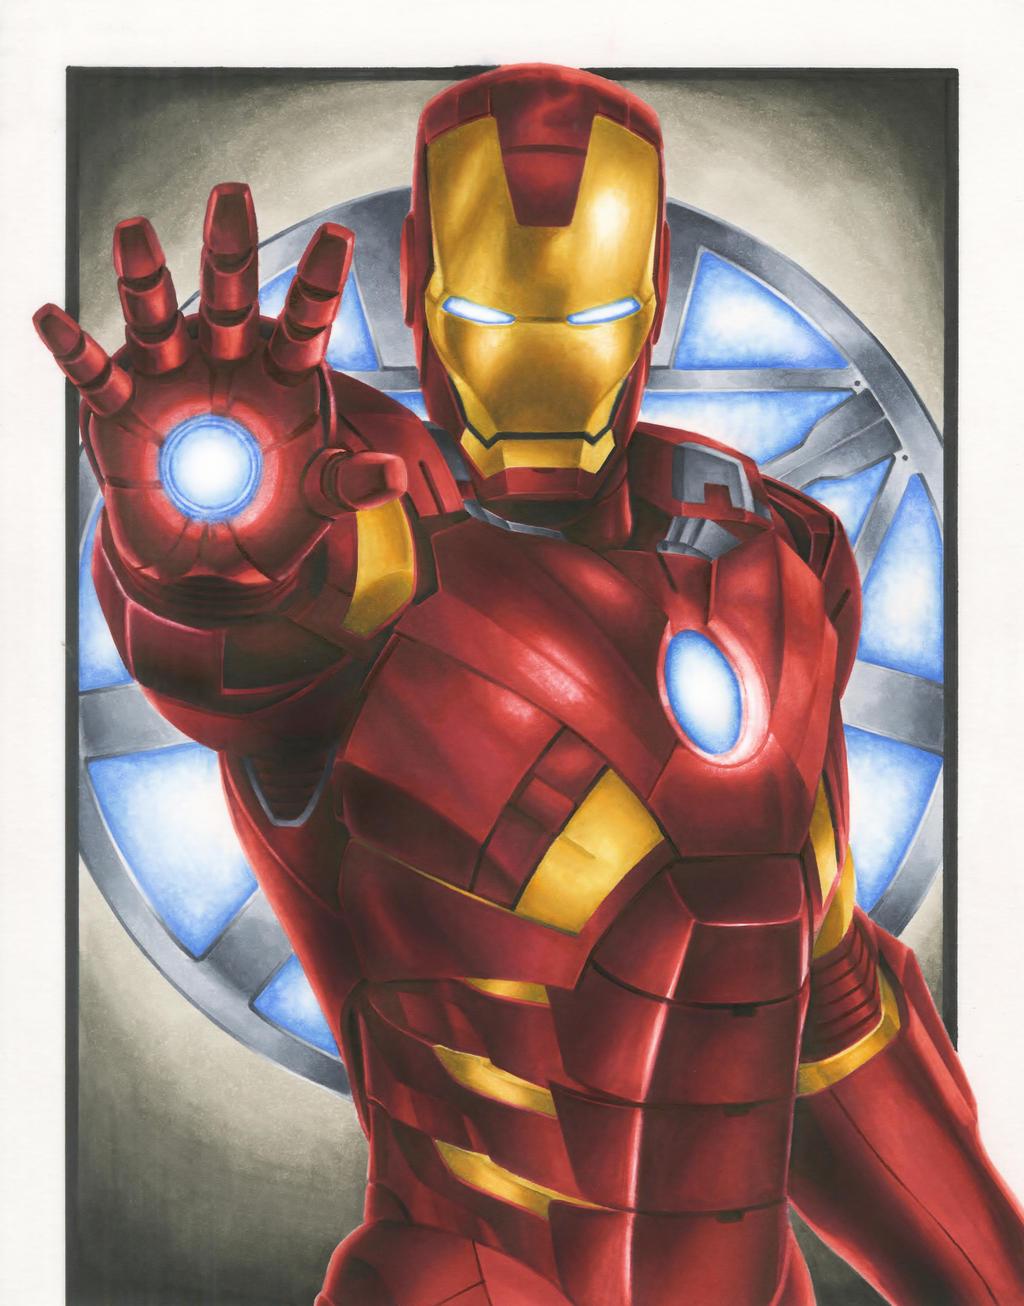 Iron man animated avengers - Iron man cartoon wallpaper ...